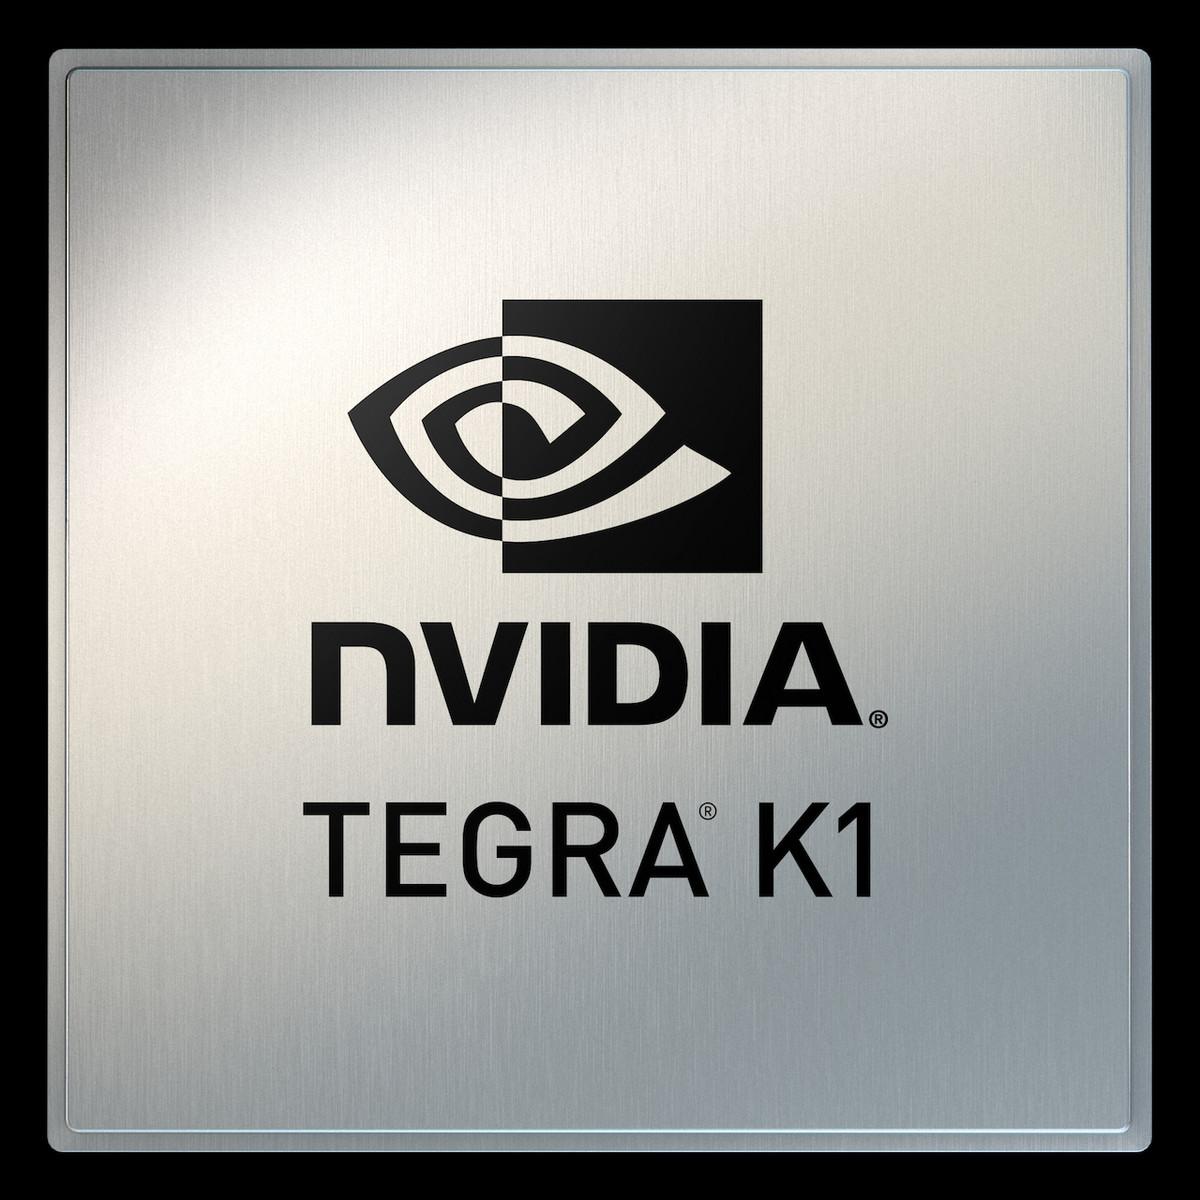 NVIDIA GeForce ULP K1 (Tegra K1 Kepler GPU) - Notebookcheck-ru com